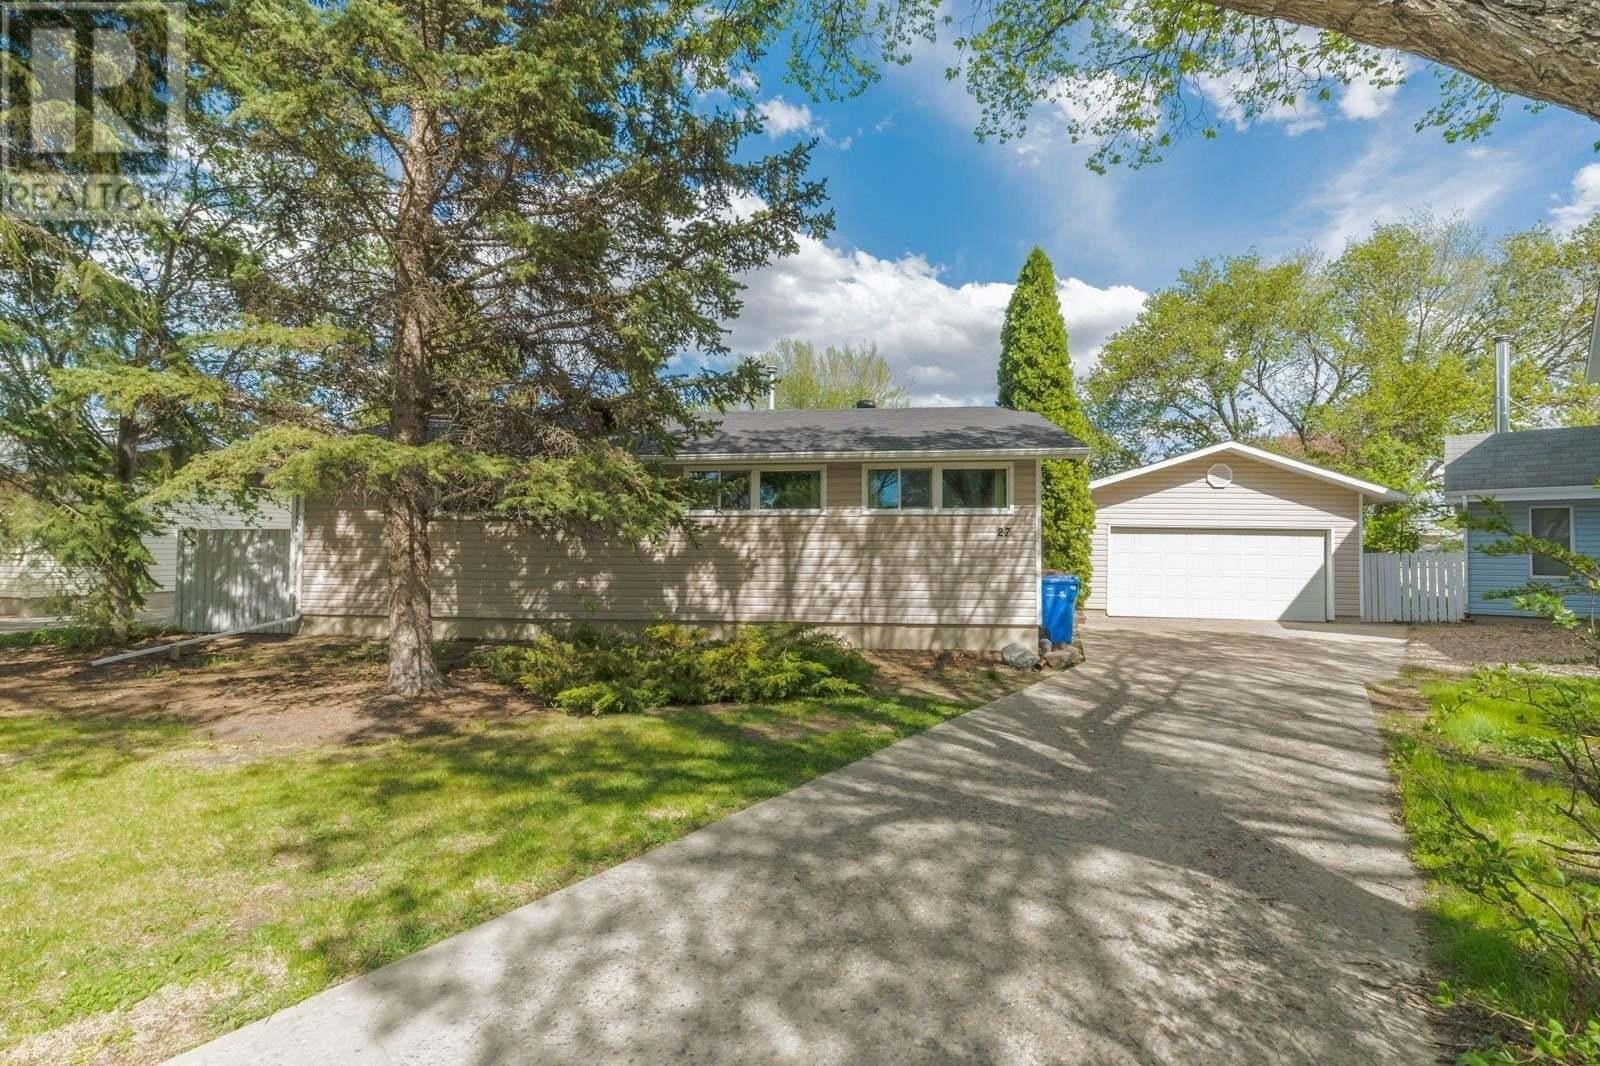 House for sale at 27 Mcinnis Cres Regina Saskatchewan - MLS: SK809394